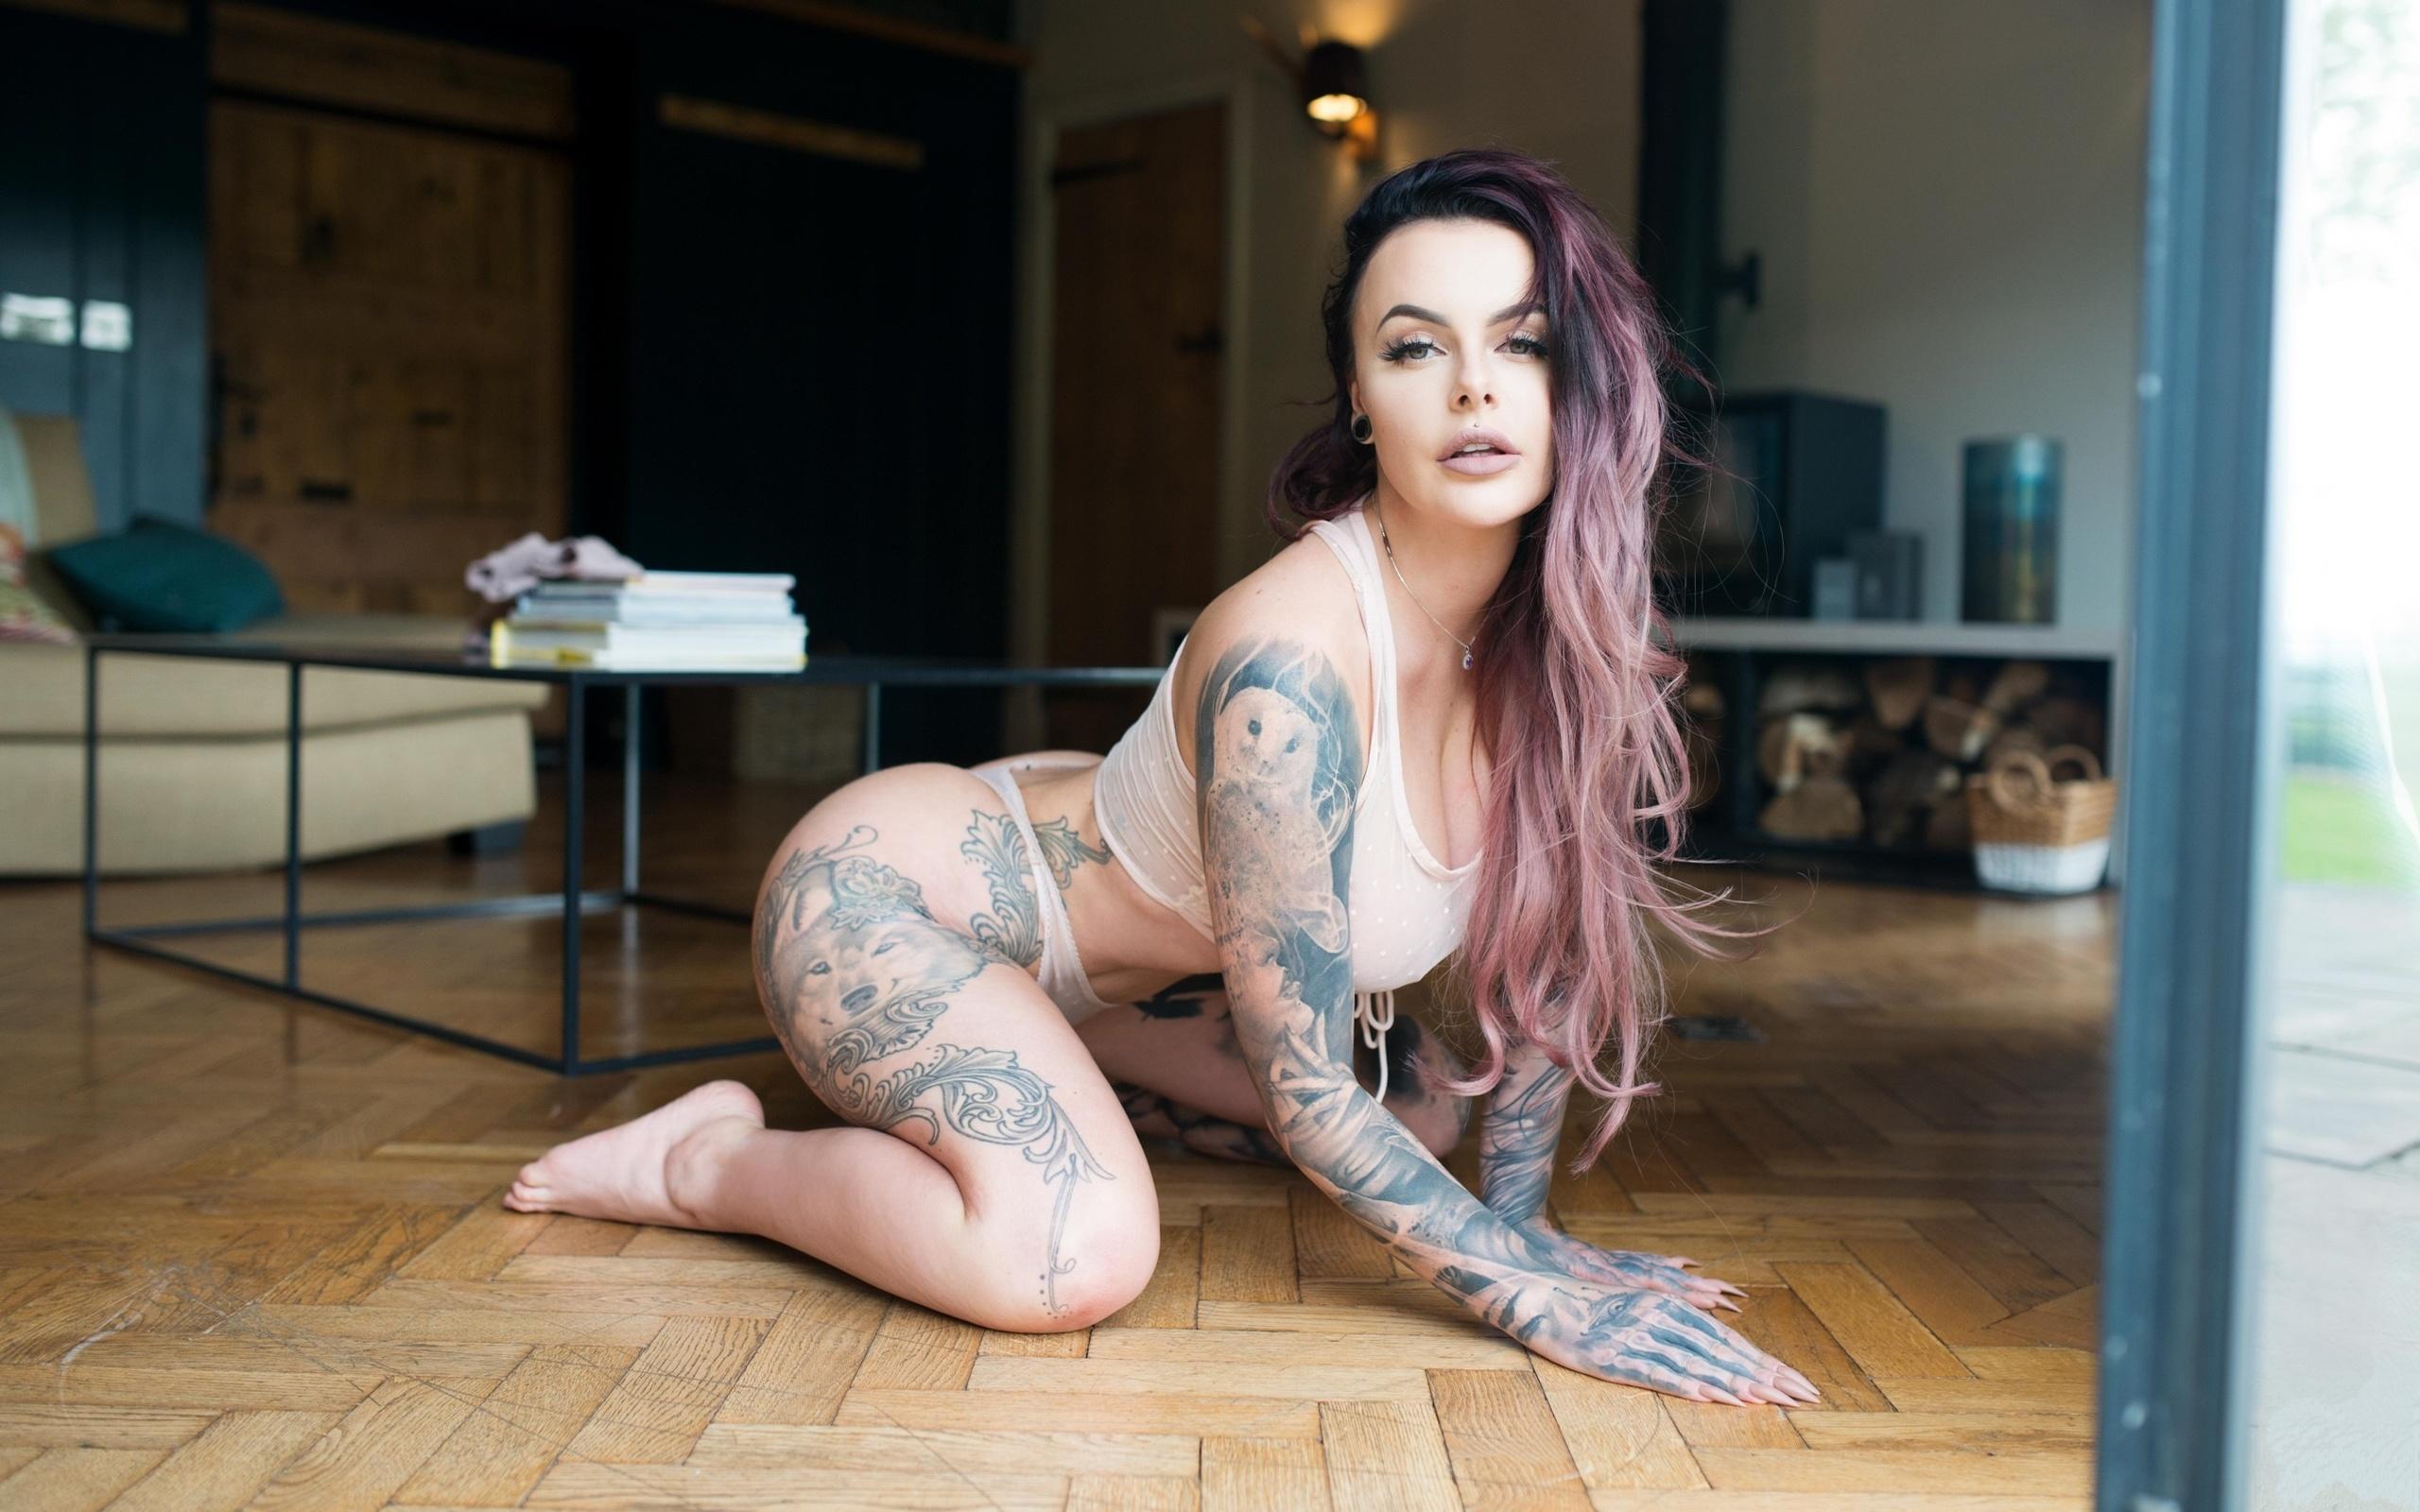 Ari myers nudes